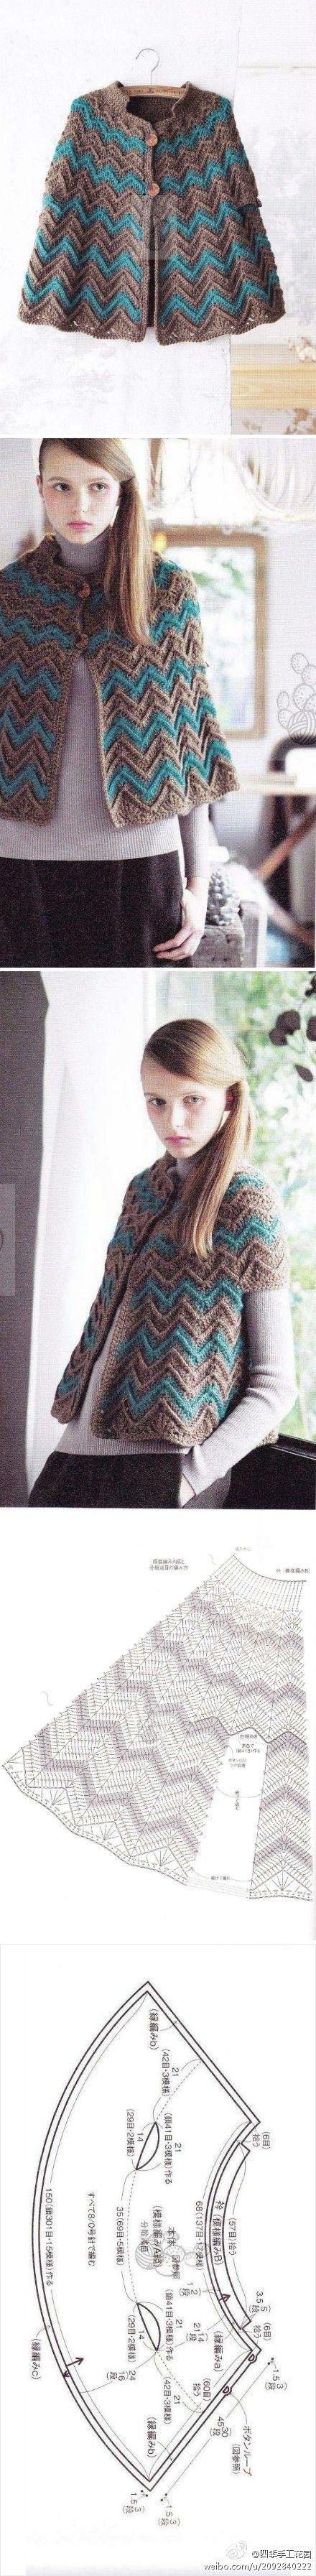 Crochet Cape - Chart ❥ 4U hilariafina http://www.pinterest.com/hilariafina/